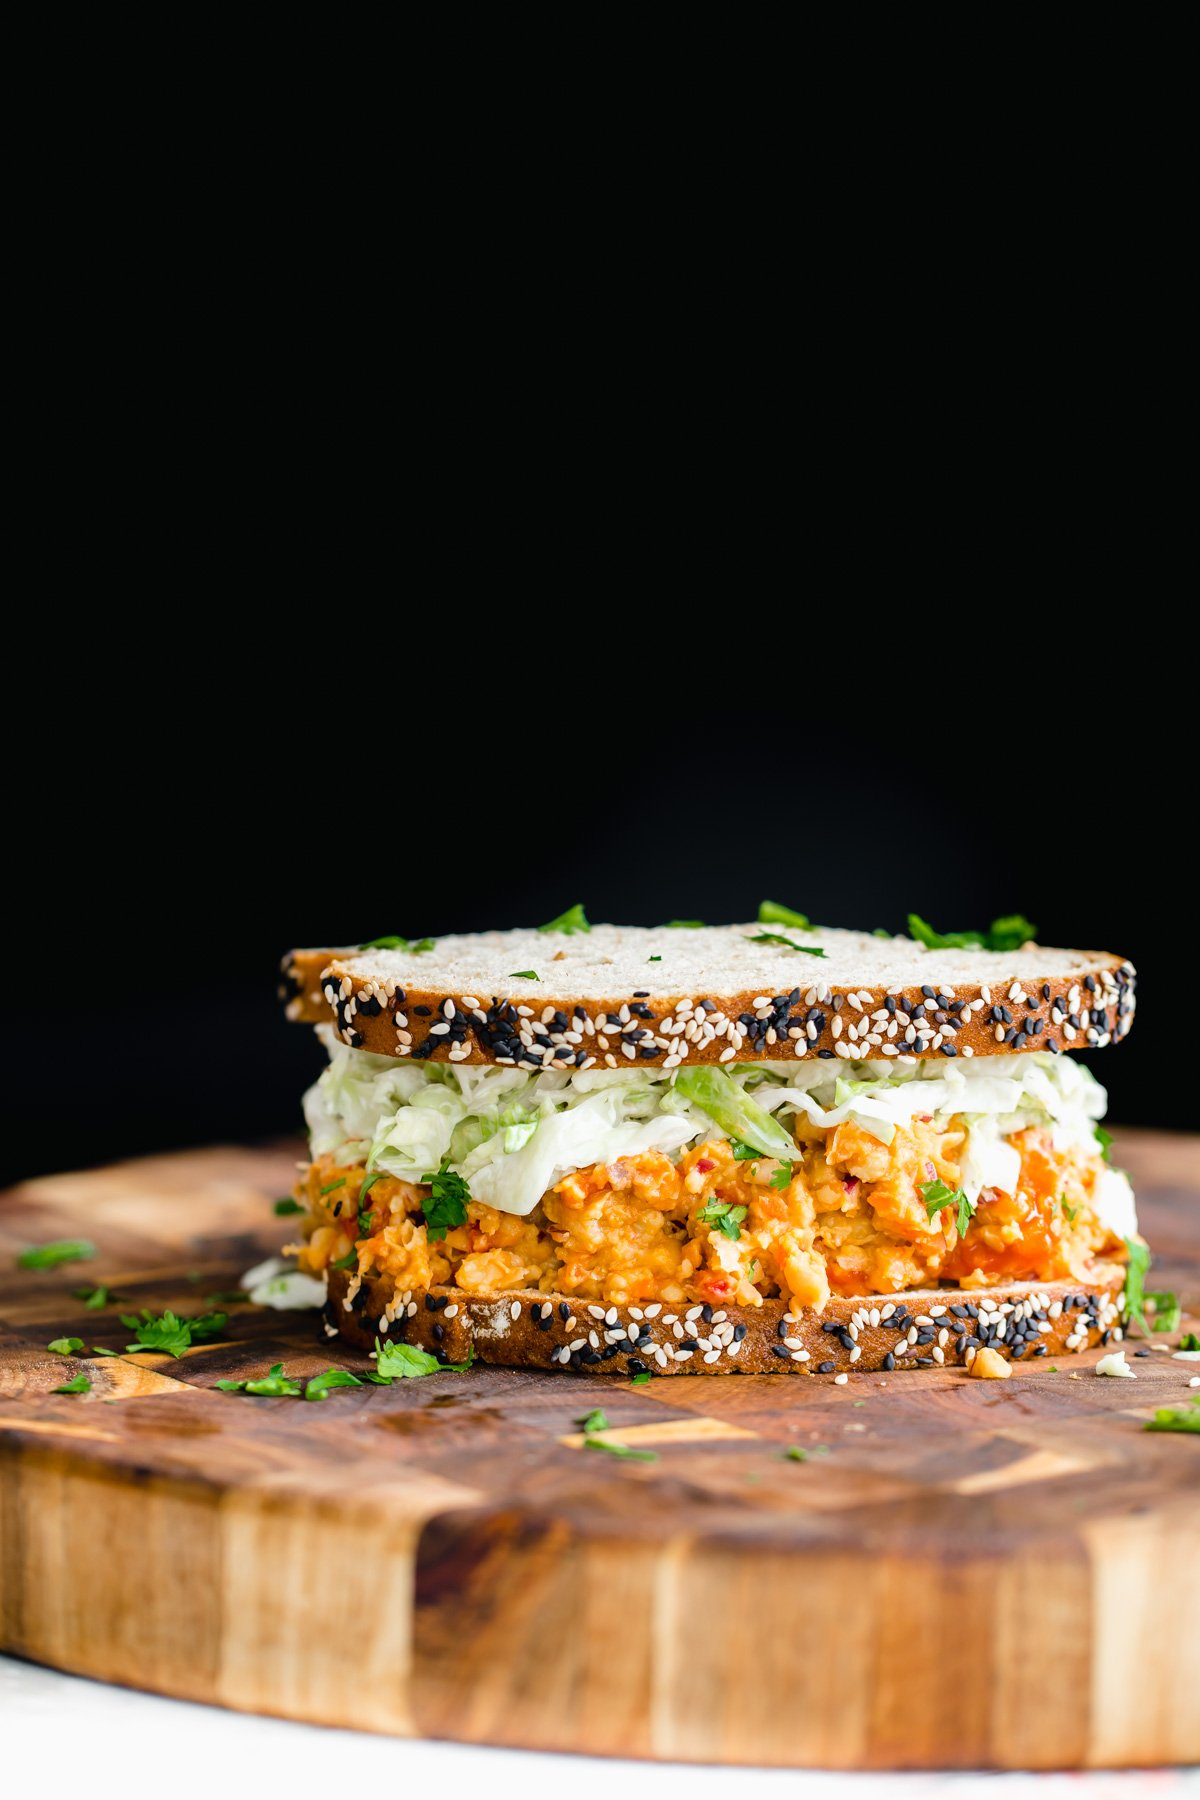 side view of vegan buffalo chickpea salad sandwich on a wooden board